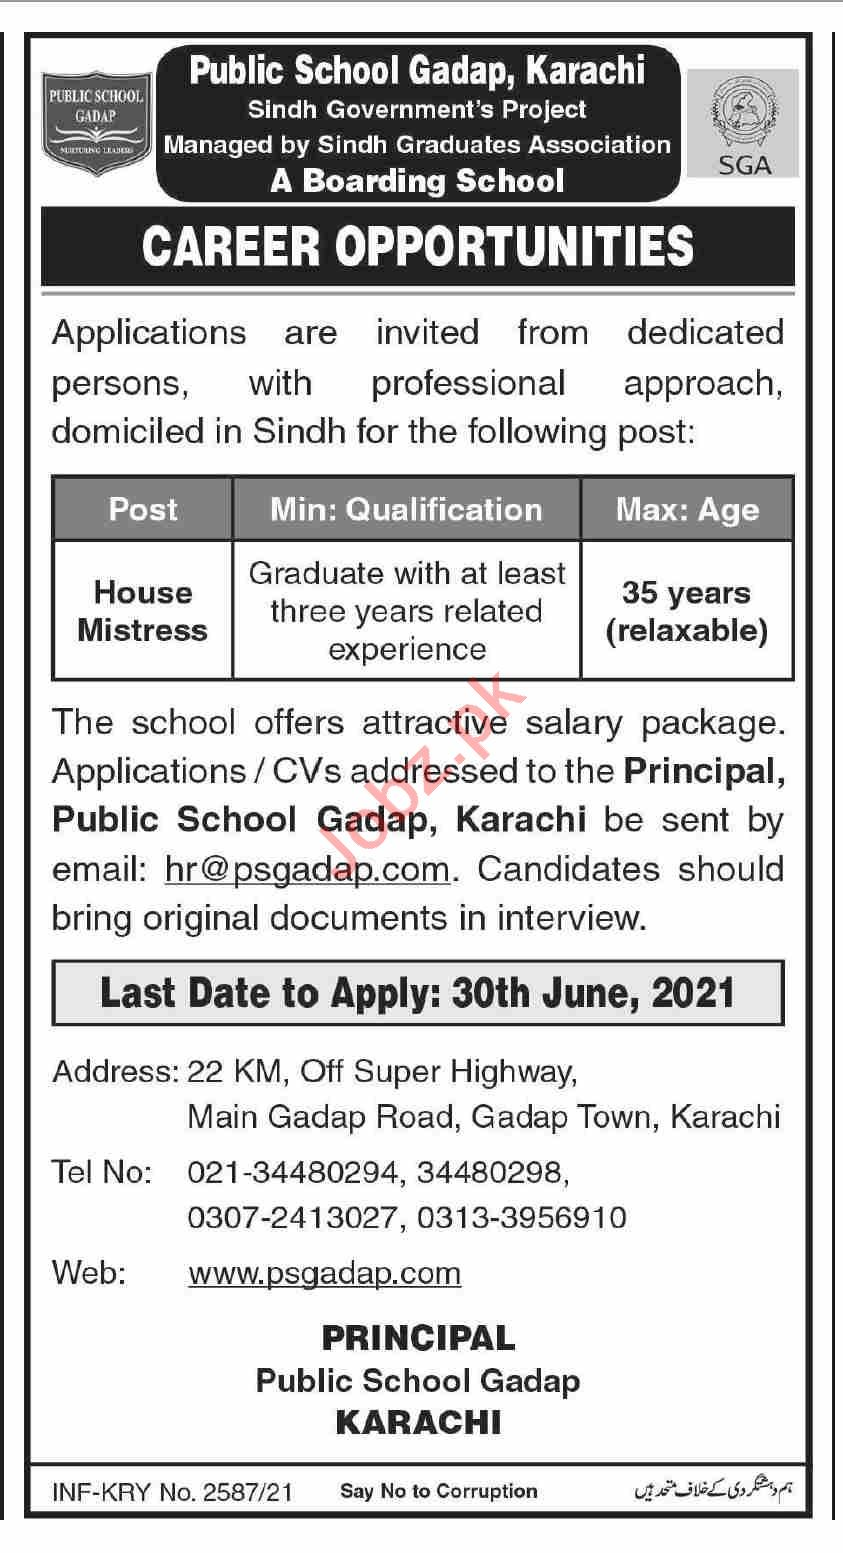 Public School Gadap Karachi Jobs 2021 for House Mistress